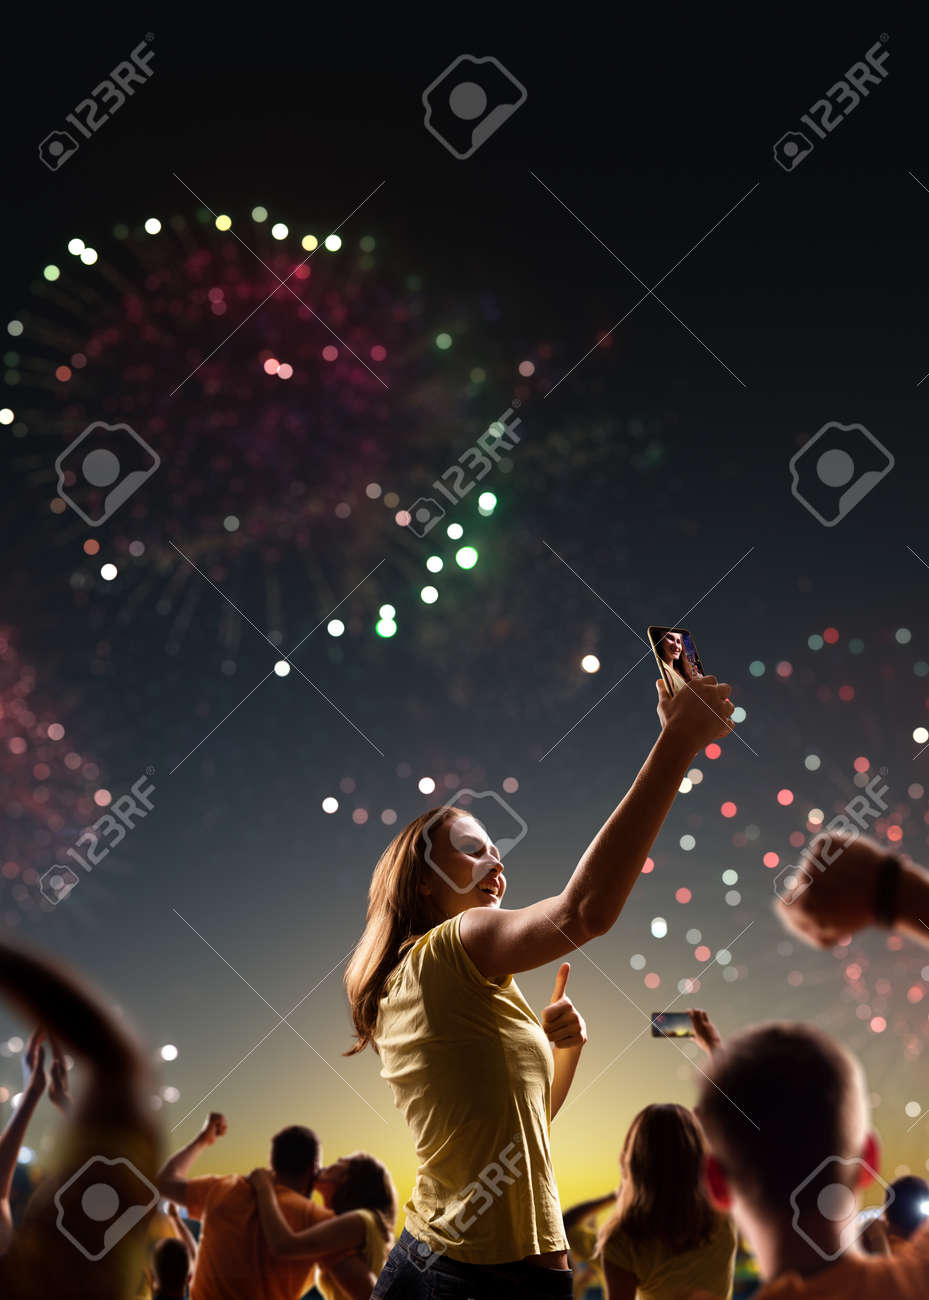 Fans celebrate in Stadium Arena night fireworks - 157291650